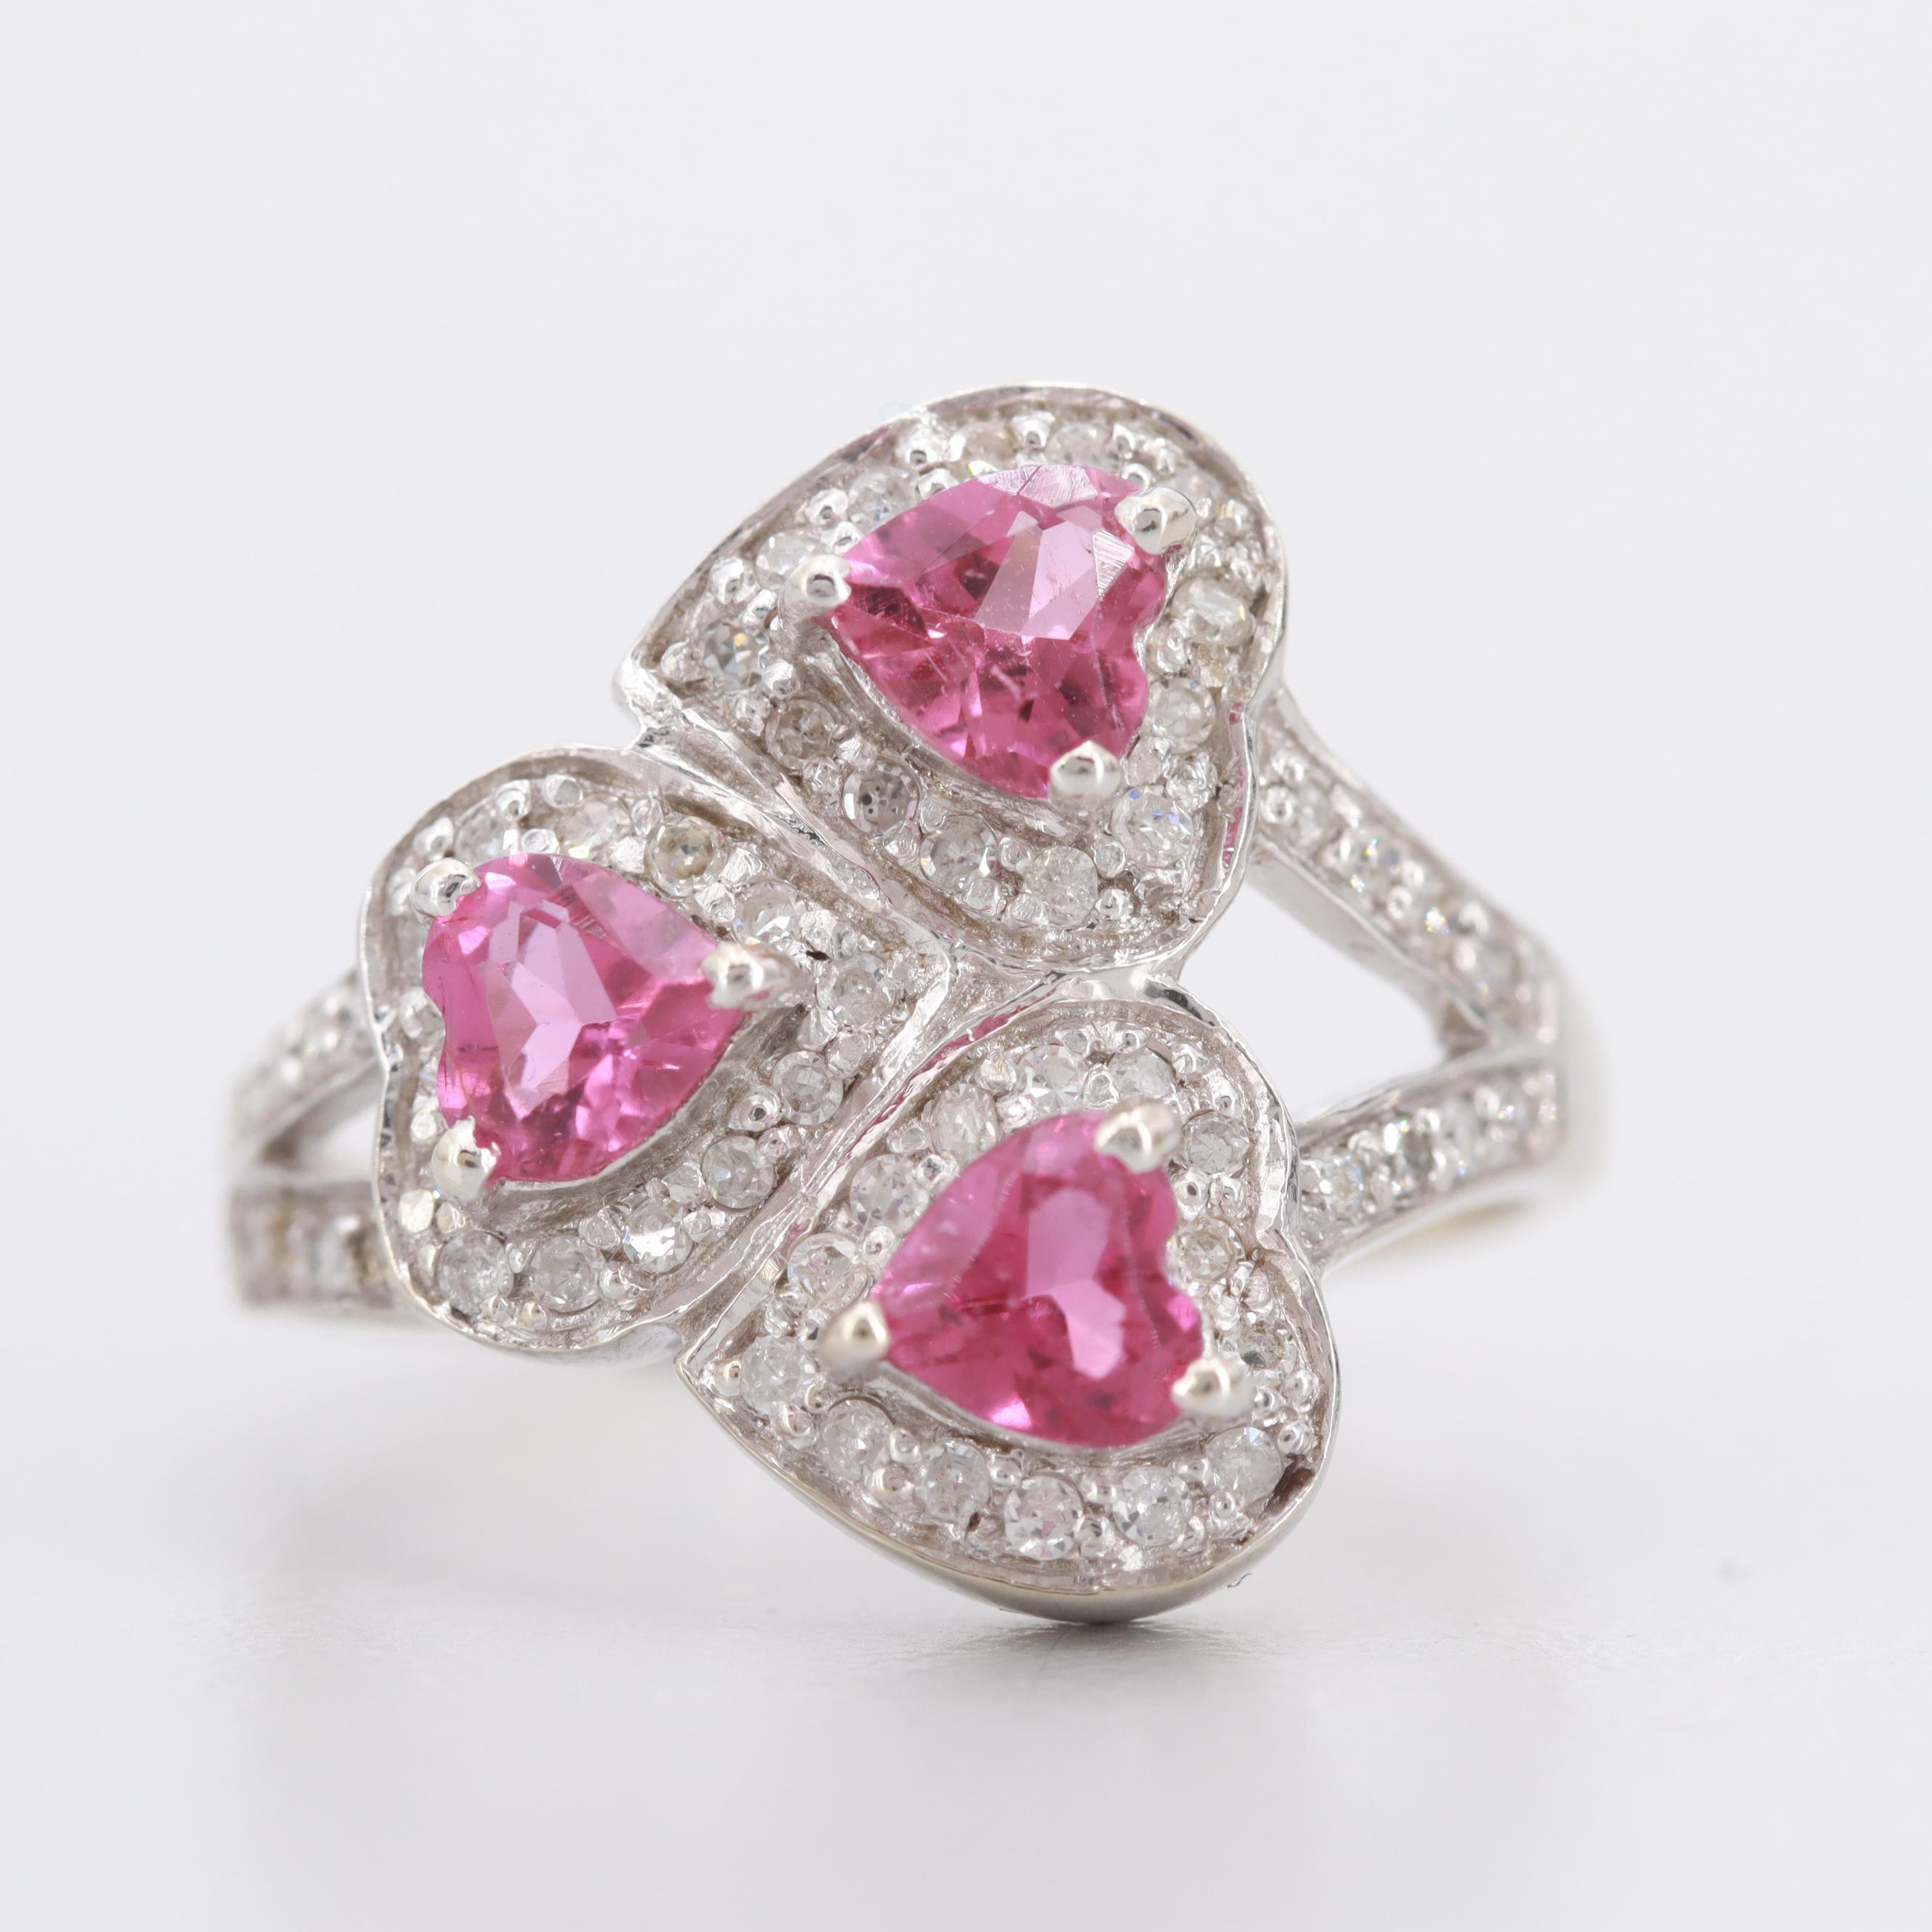 14K White Gold Pink Tourmaline and Diamond Ring